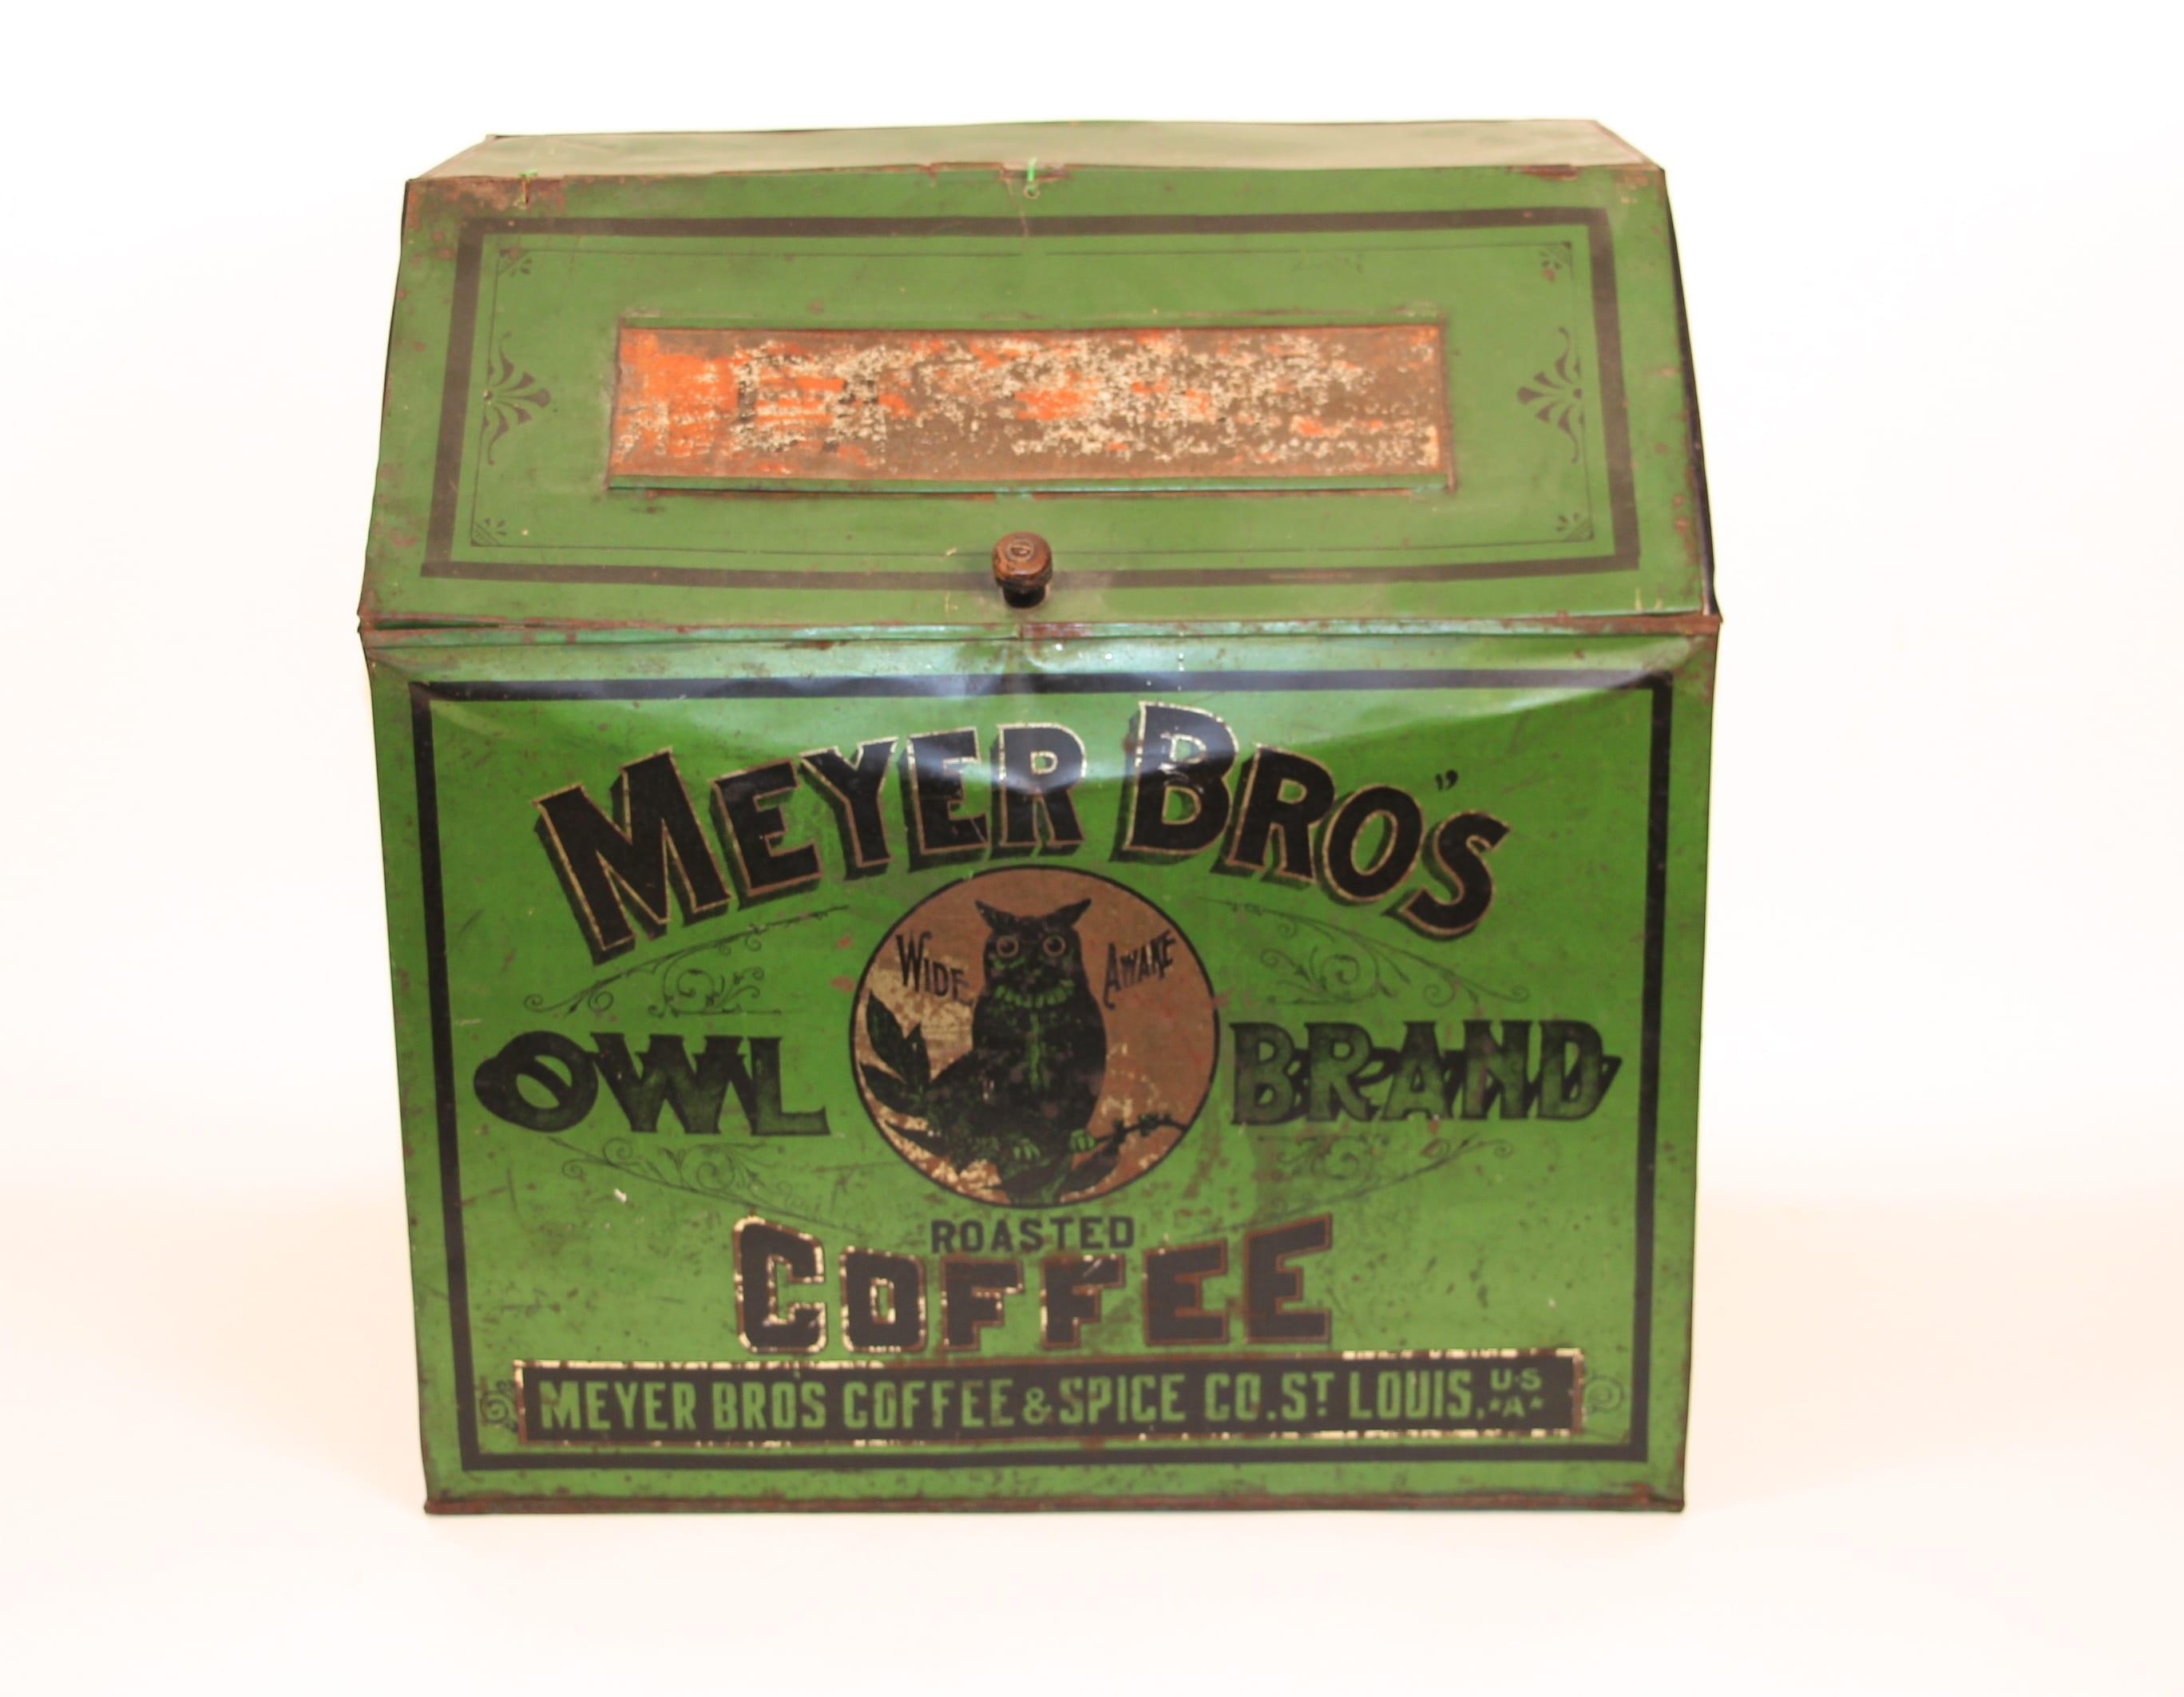 Meyer Bros Owl Brand Coffee Display Bin, St. Louis, MO